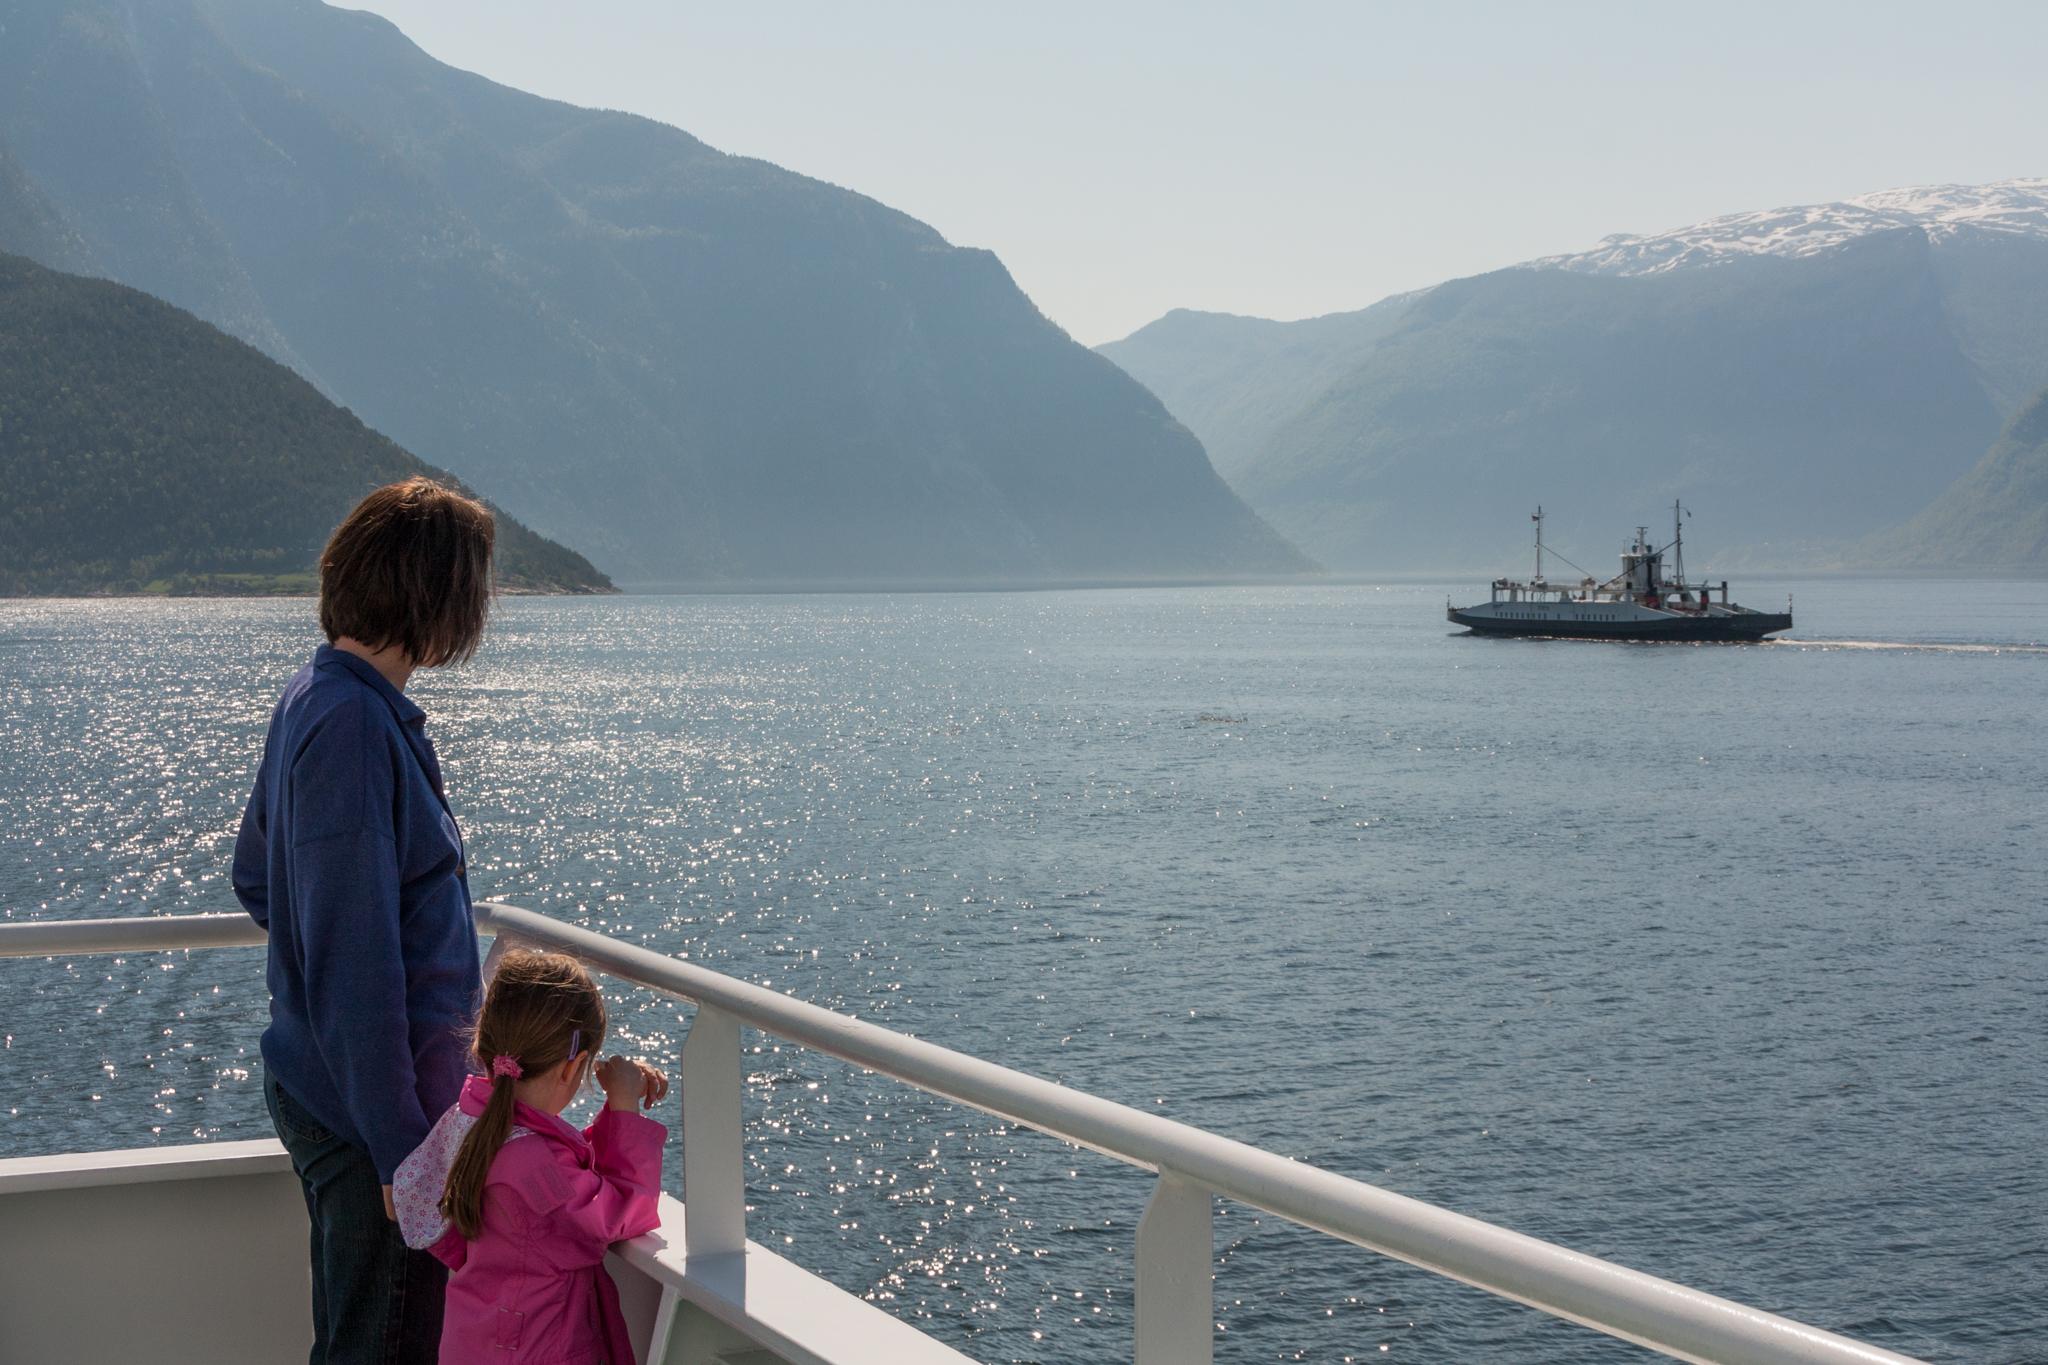 Ferries Fodnes-Mannheller, Sognefjord, Norway